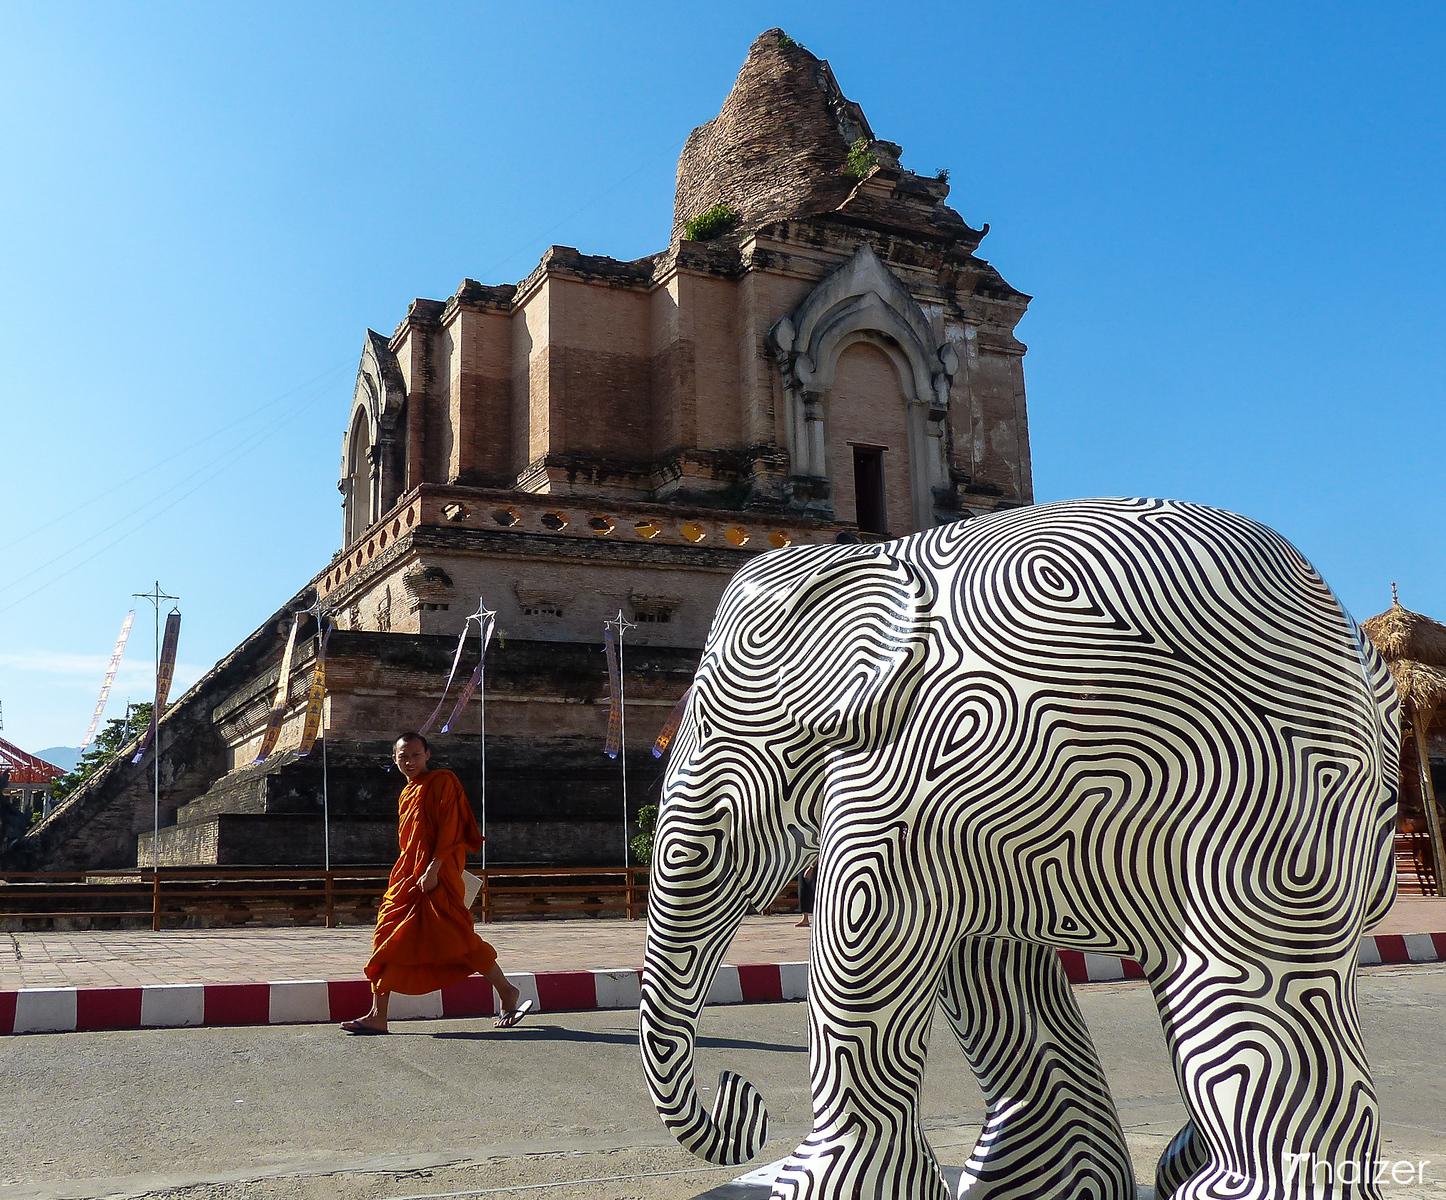 elephant and monk at Wat Chedi Luang, Chiang Mai